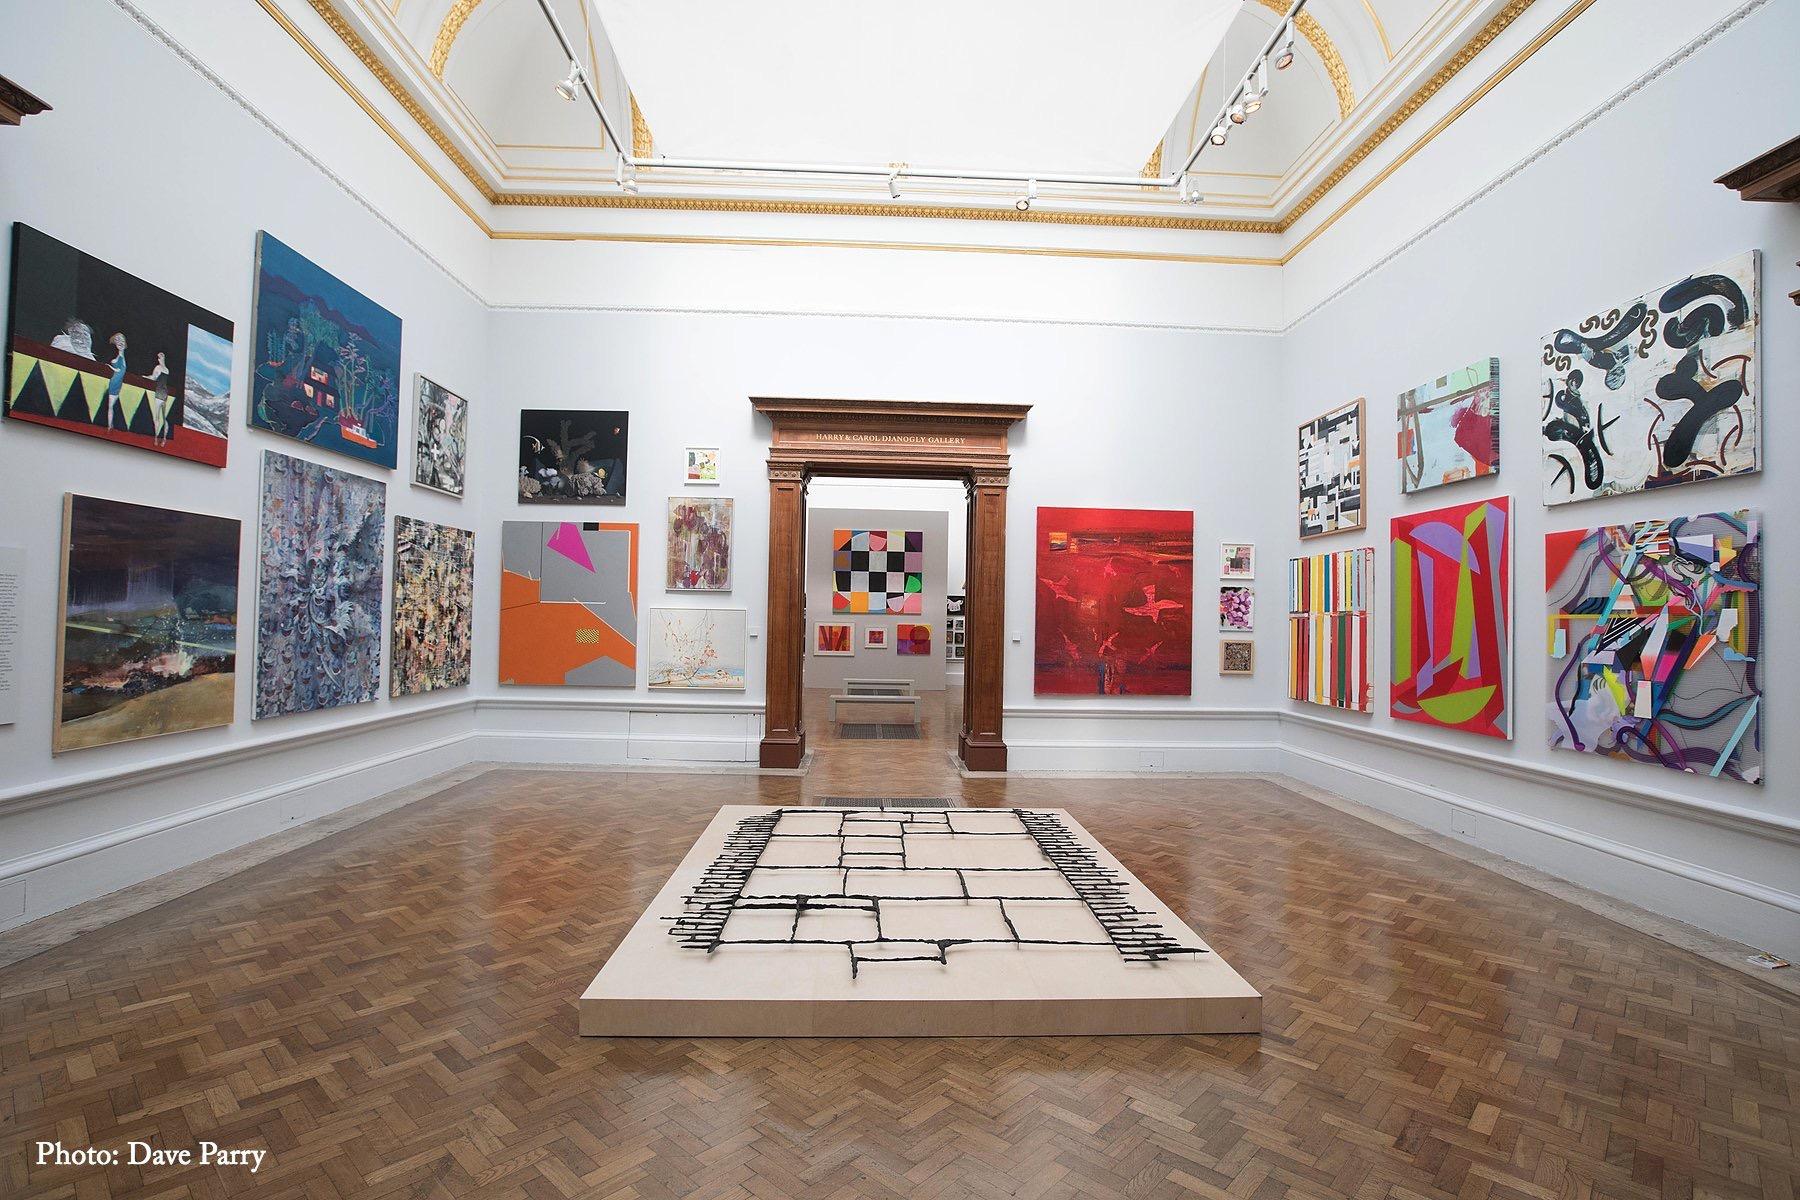 Royal Academy Summer Exhibition: Gallery II